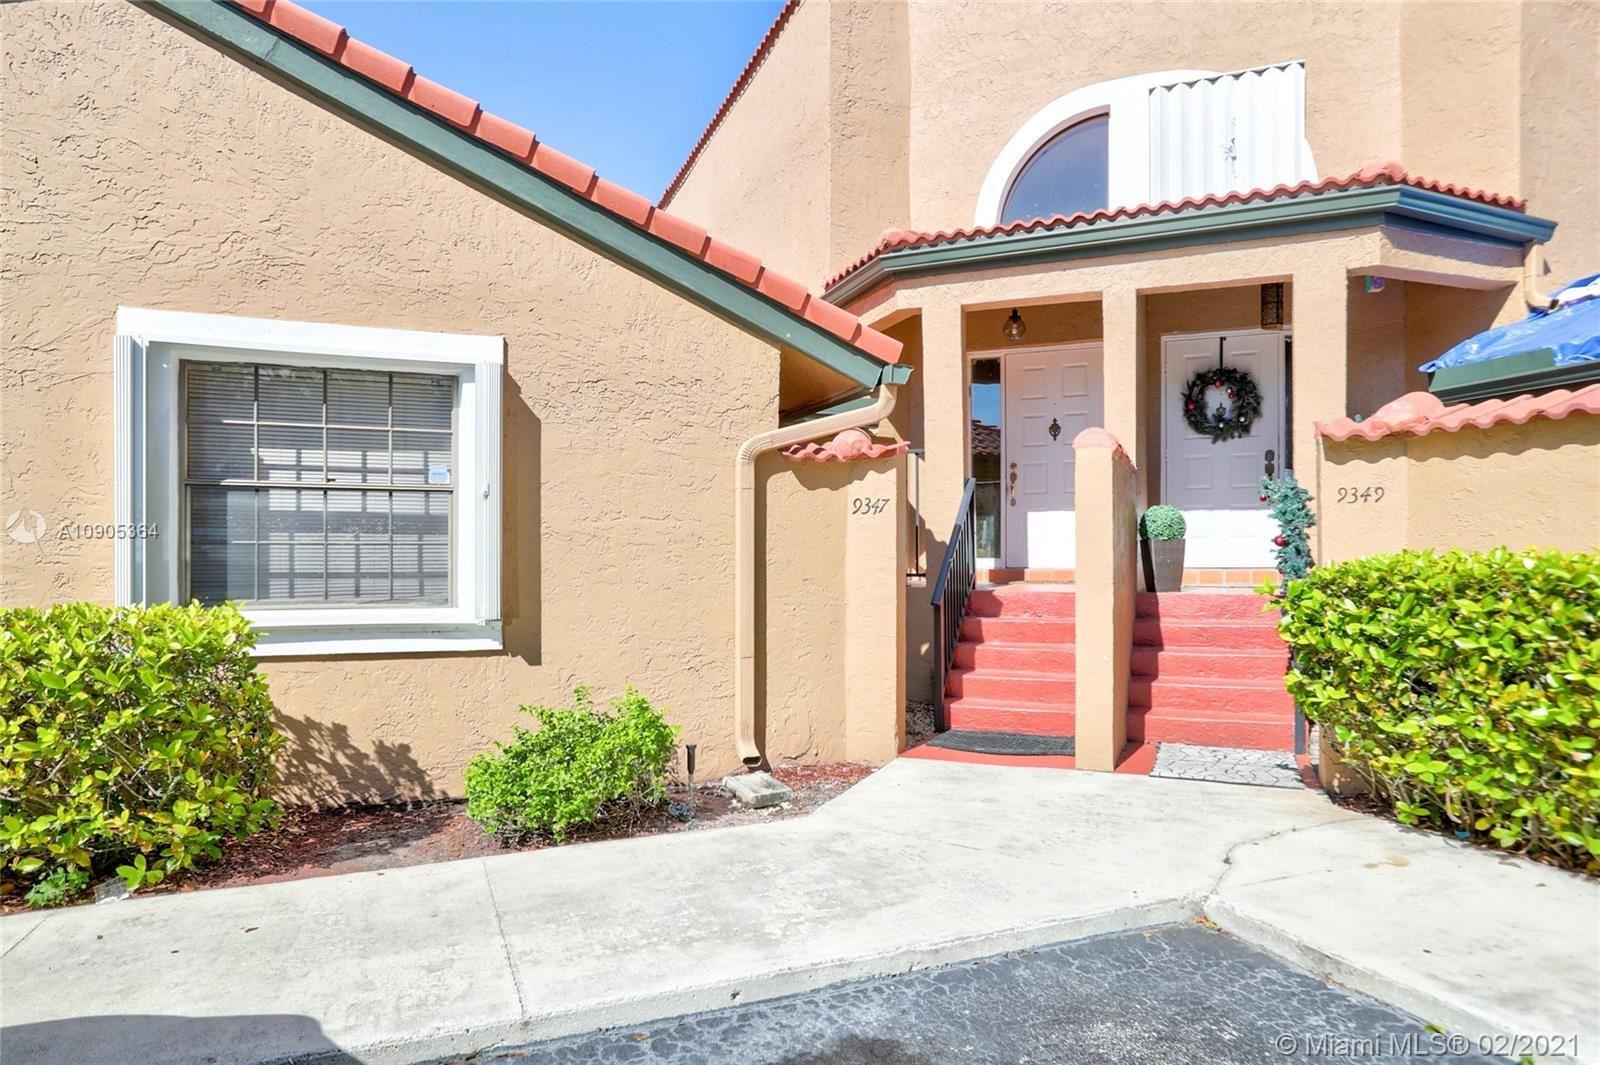 9347 W Sunrise Blvd, Plantation, FL 33322 - #: A10905364